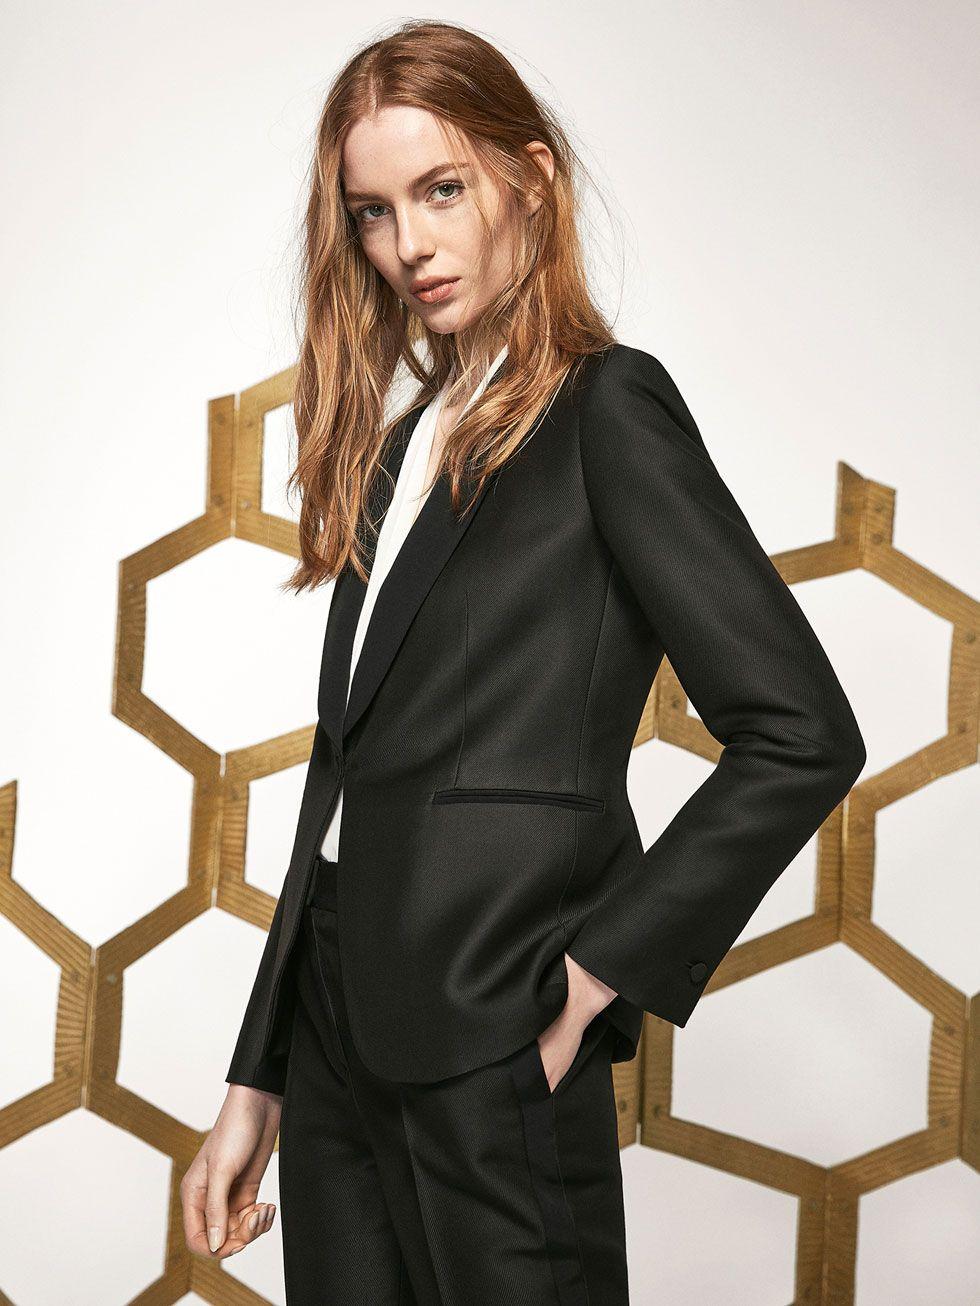 Massimo Fashion Trajes Dutti Pinterest España Traje Mujer OBB4xZ